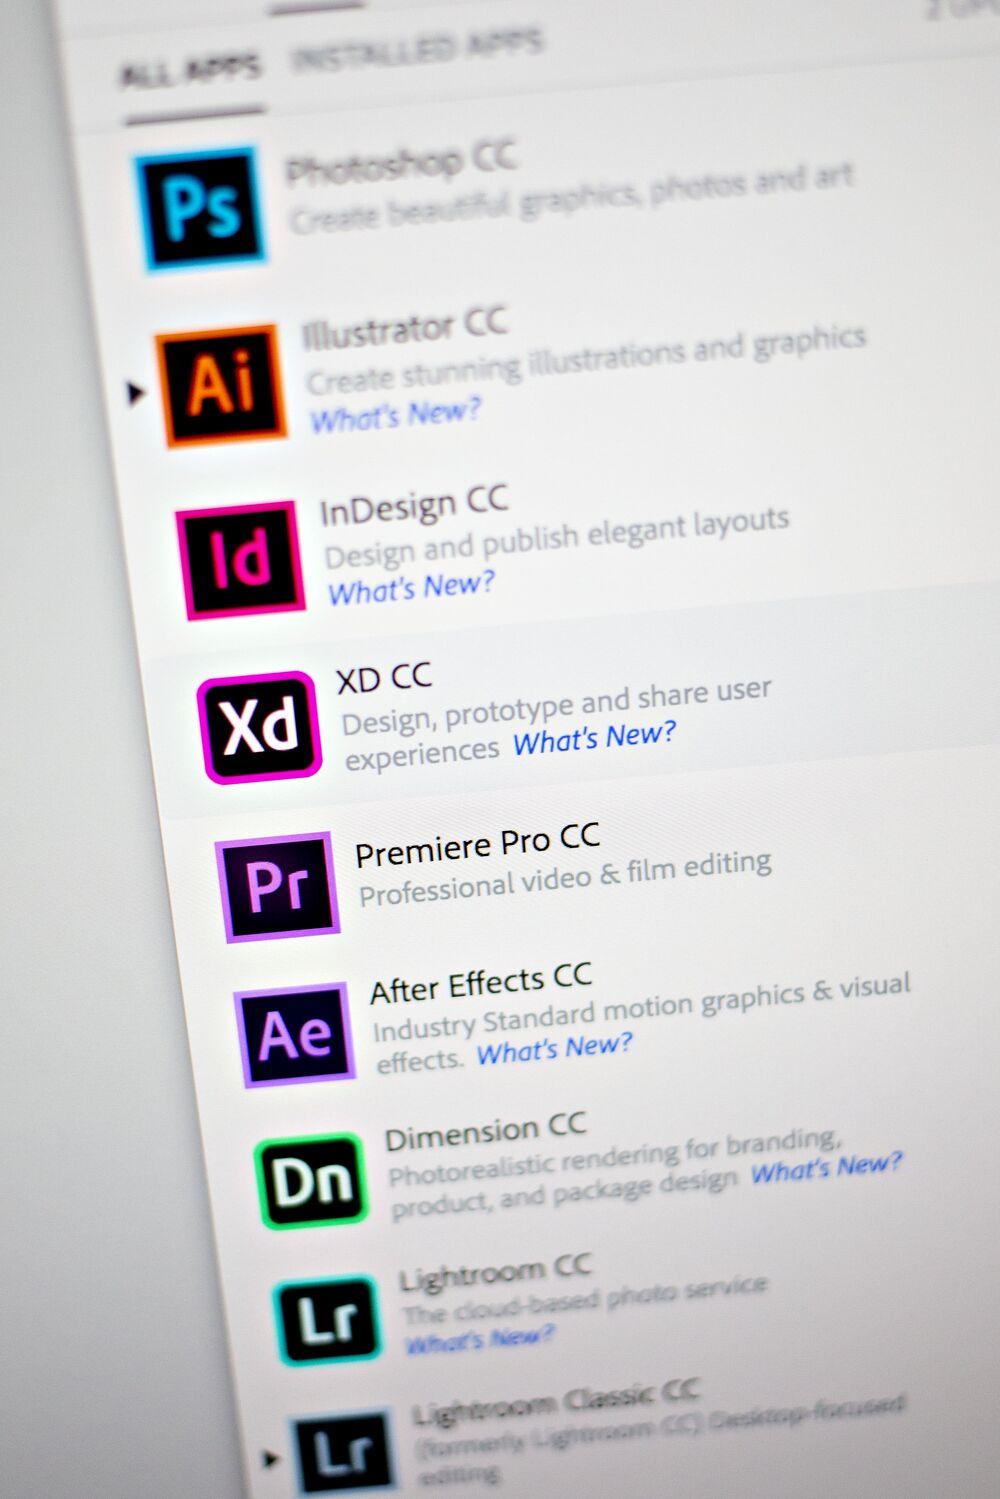 Adobe Sales Forecast Beats Estimates as Creative Products